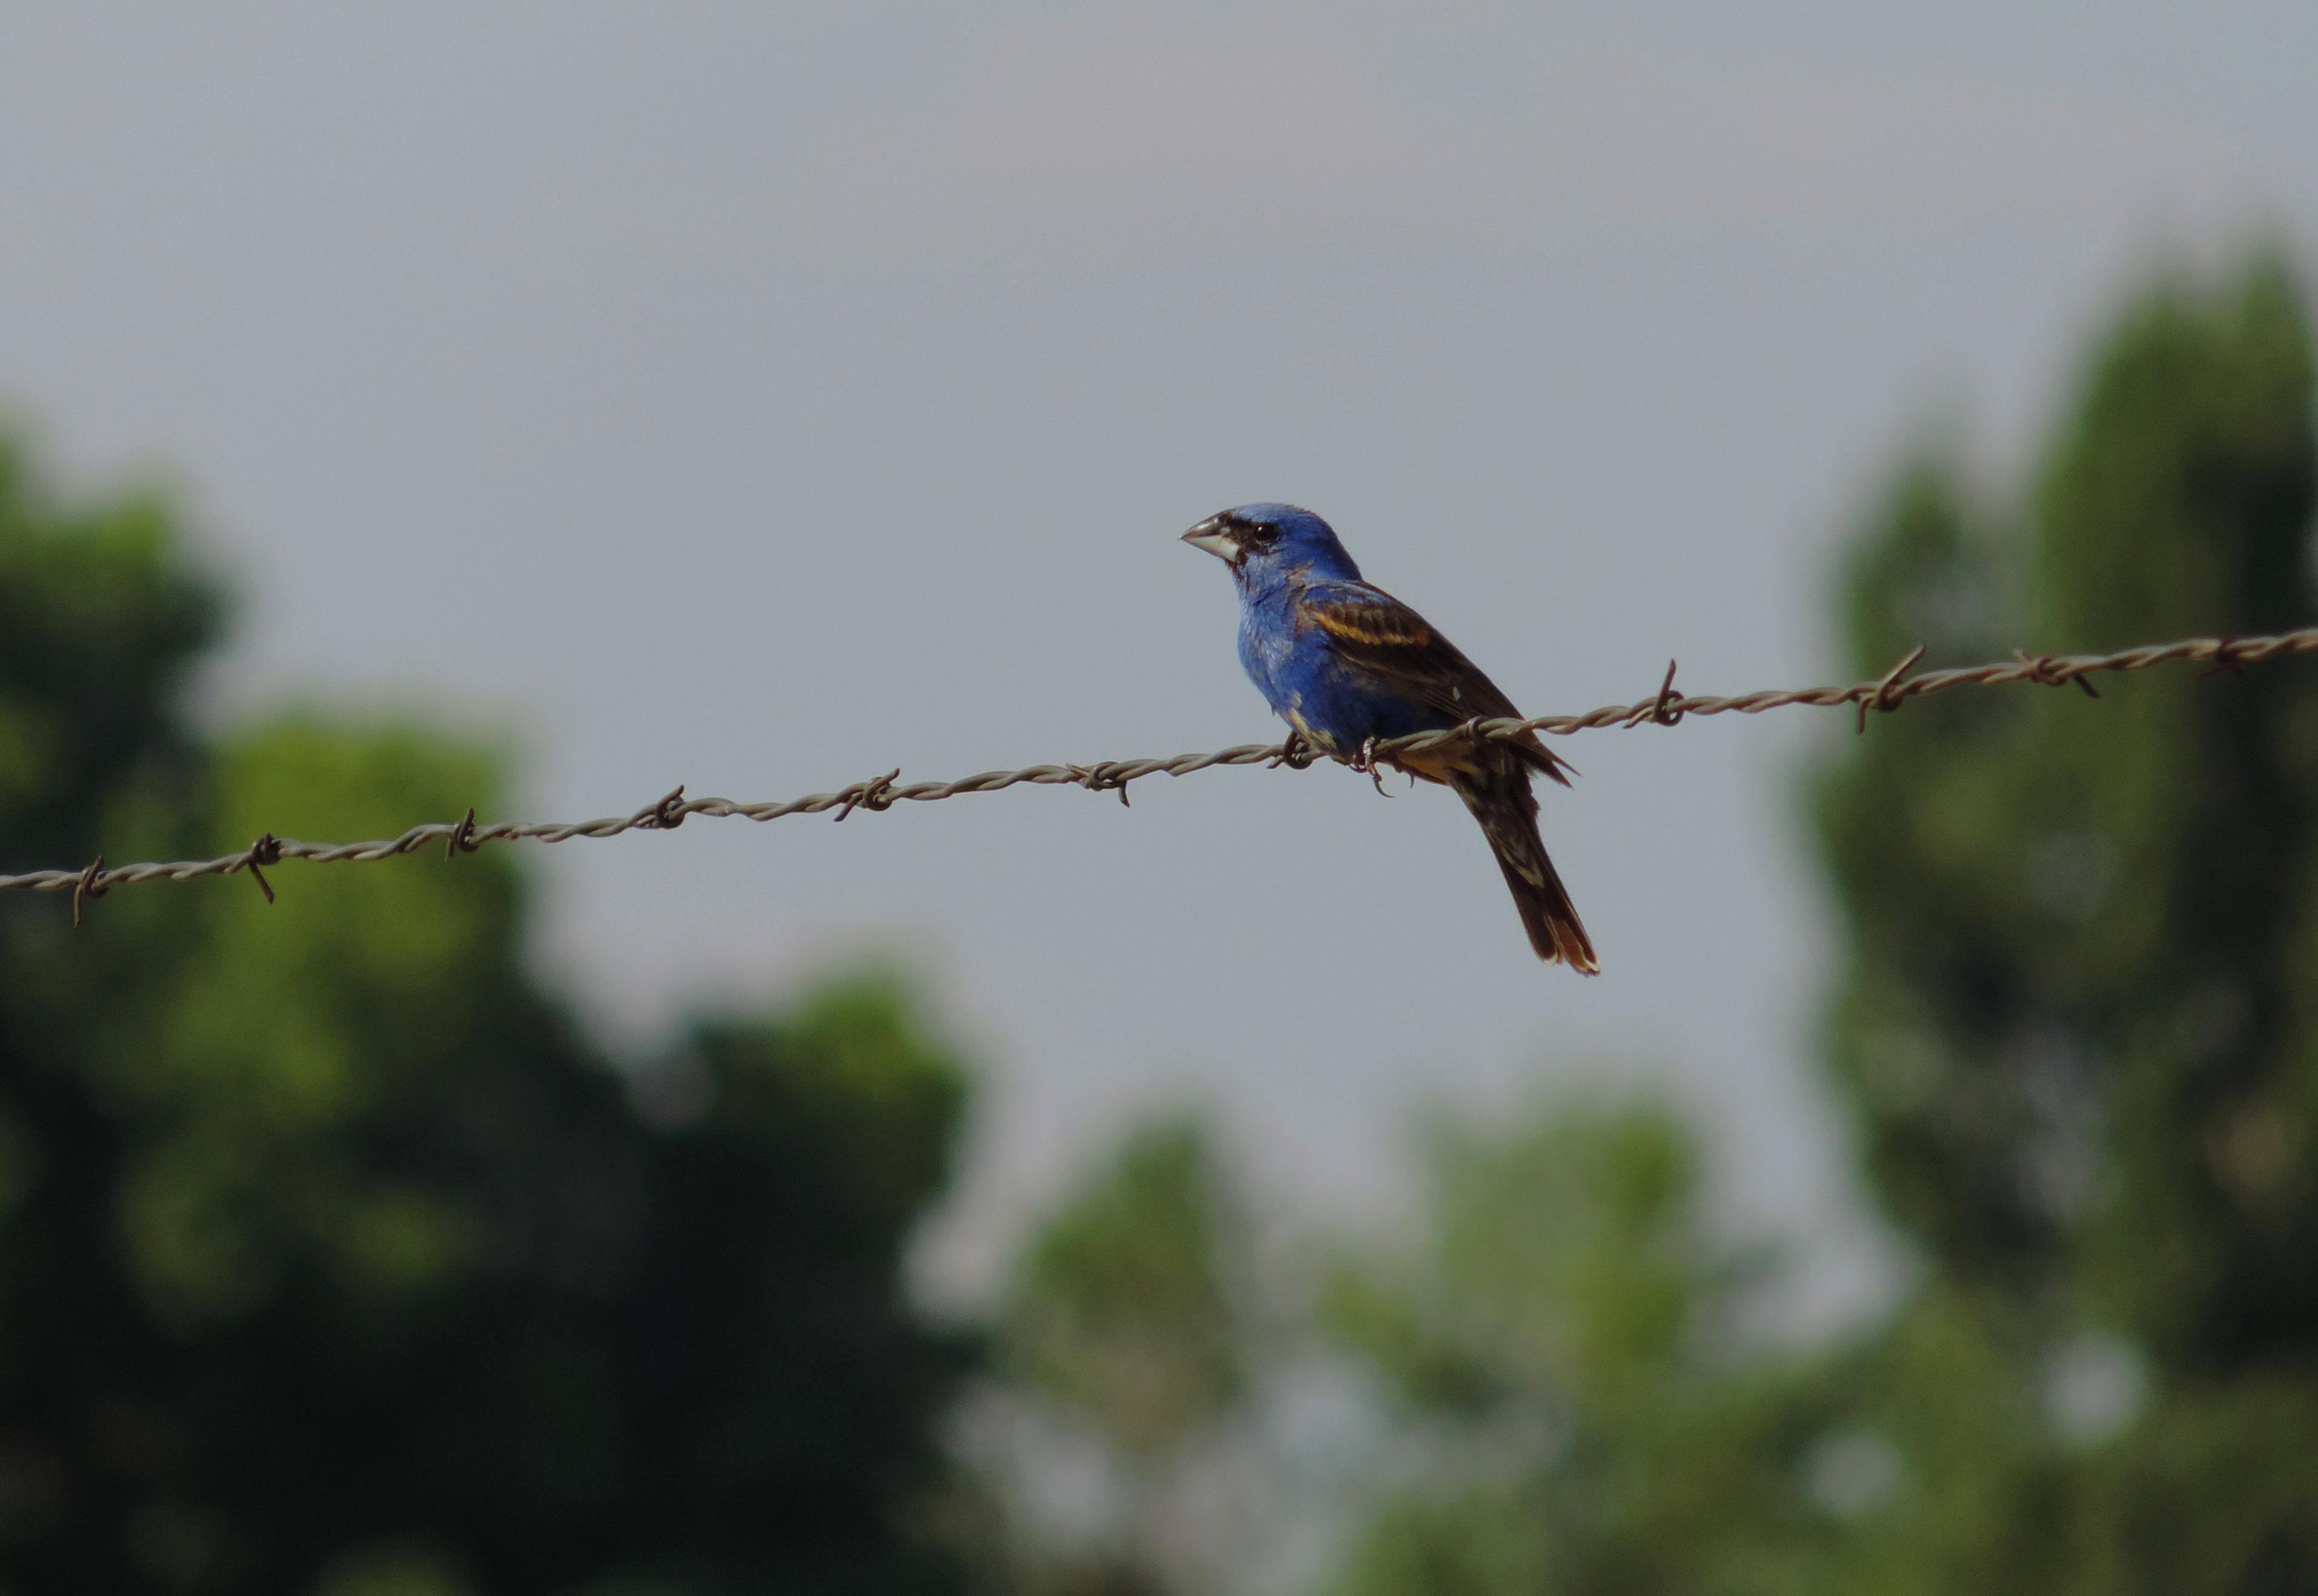 Free picture: blue, grosbeak, bird, wire, small, bird